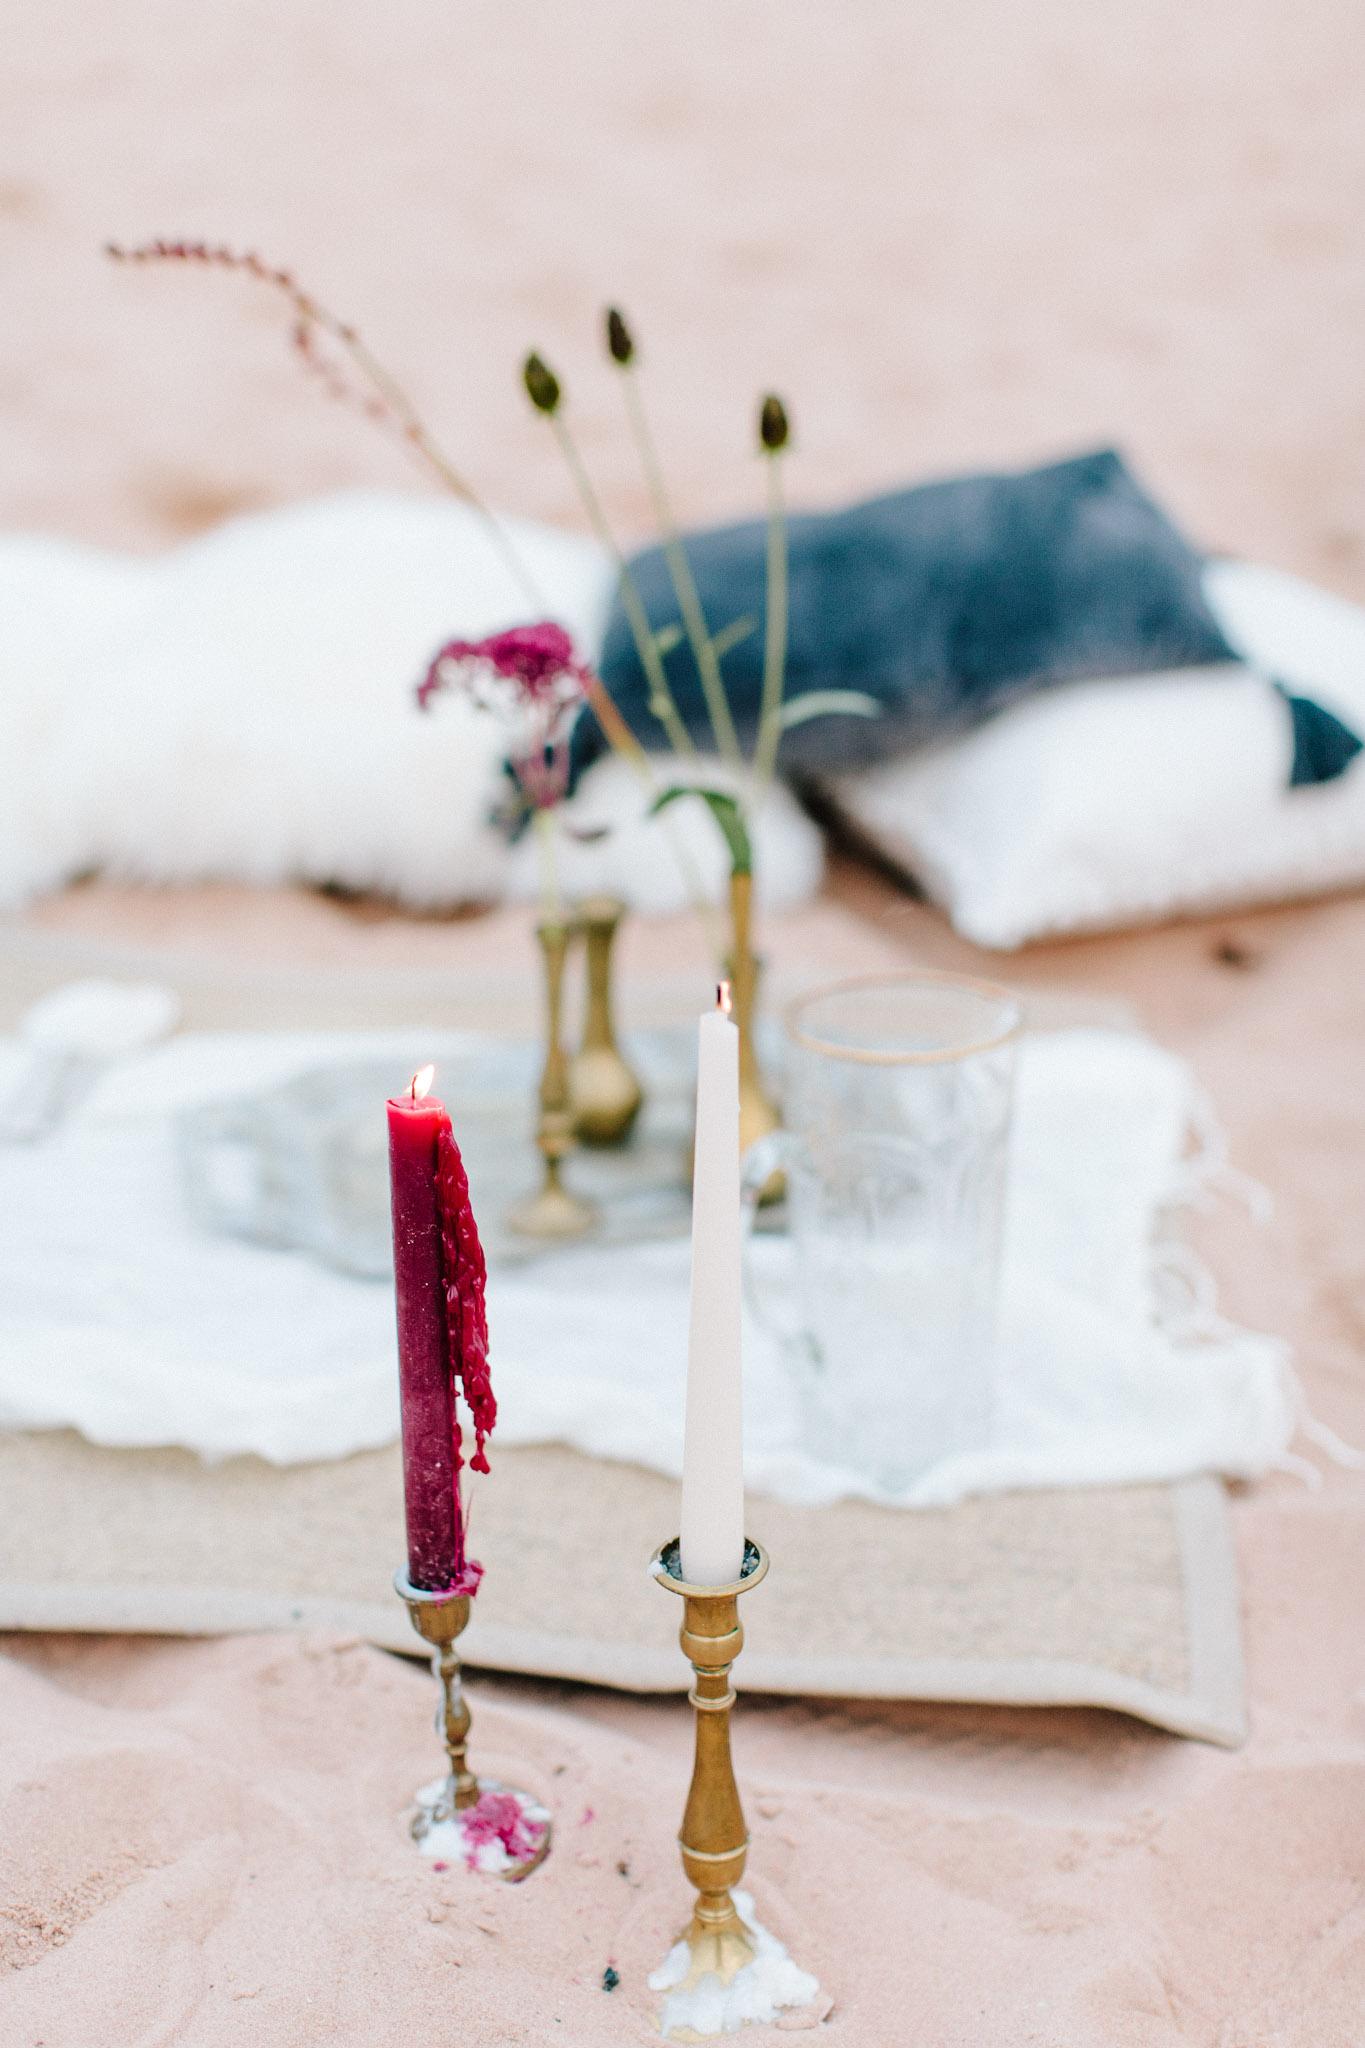 Speyer-Moroccan-Wedding-Inspiration-Pia-Anna-Christian-Wedding-Photography-S-57.jpg